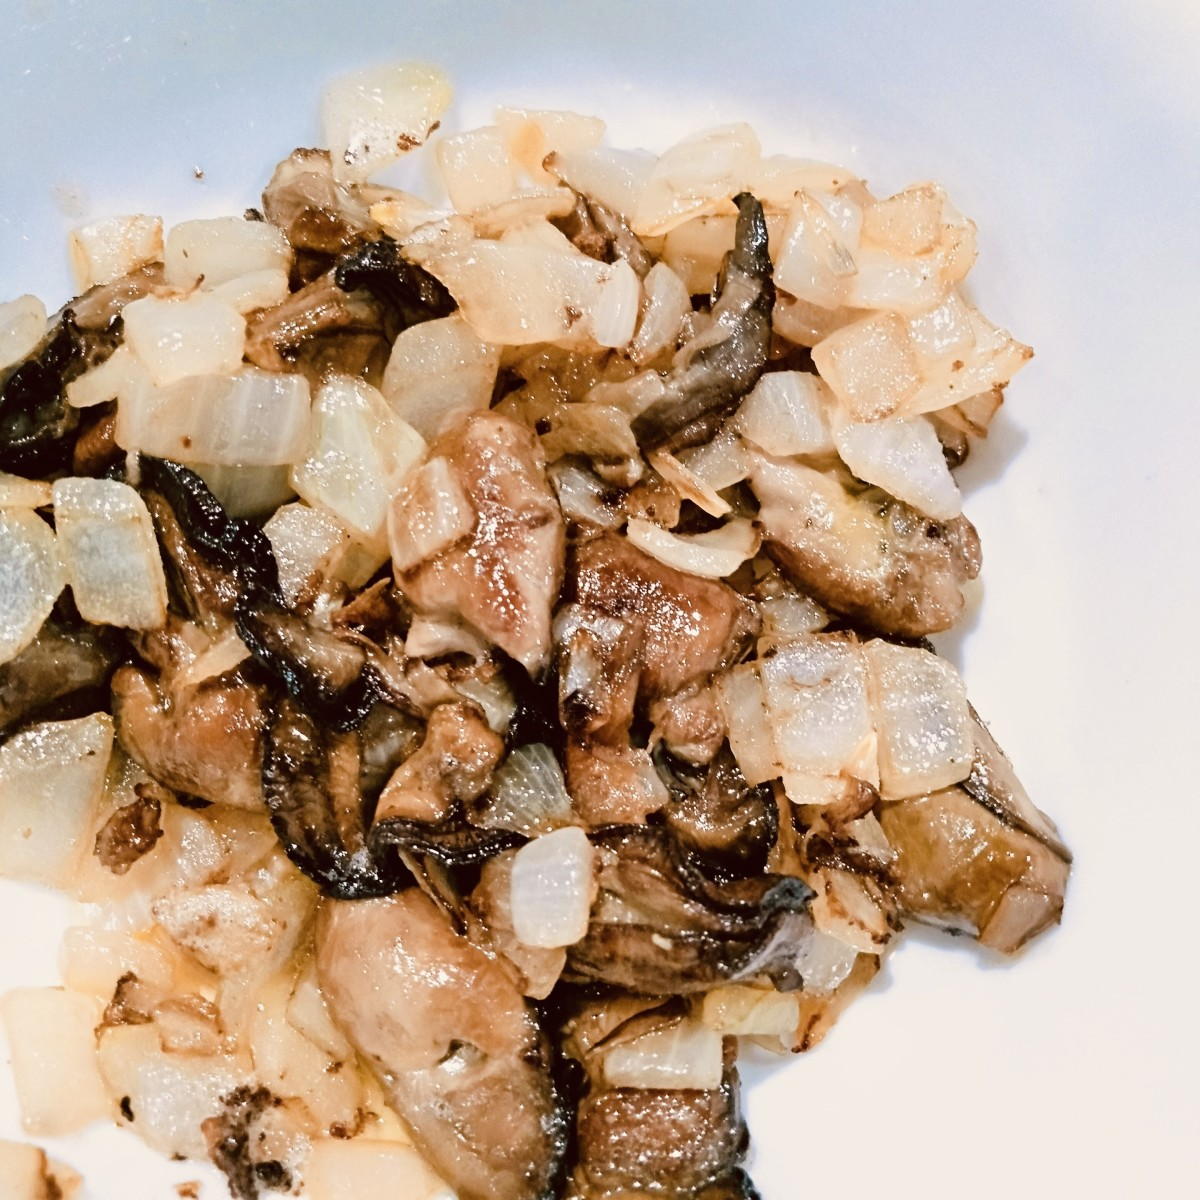 Stir-fried smoked oysters